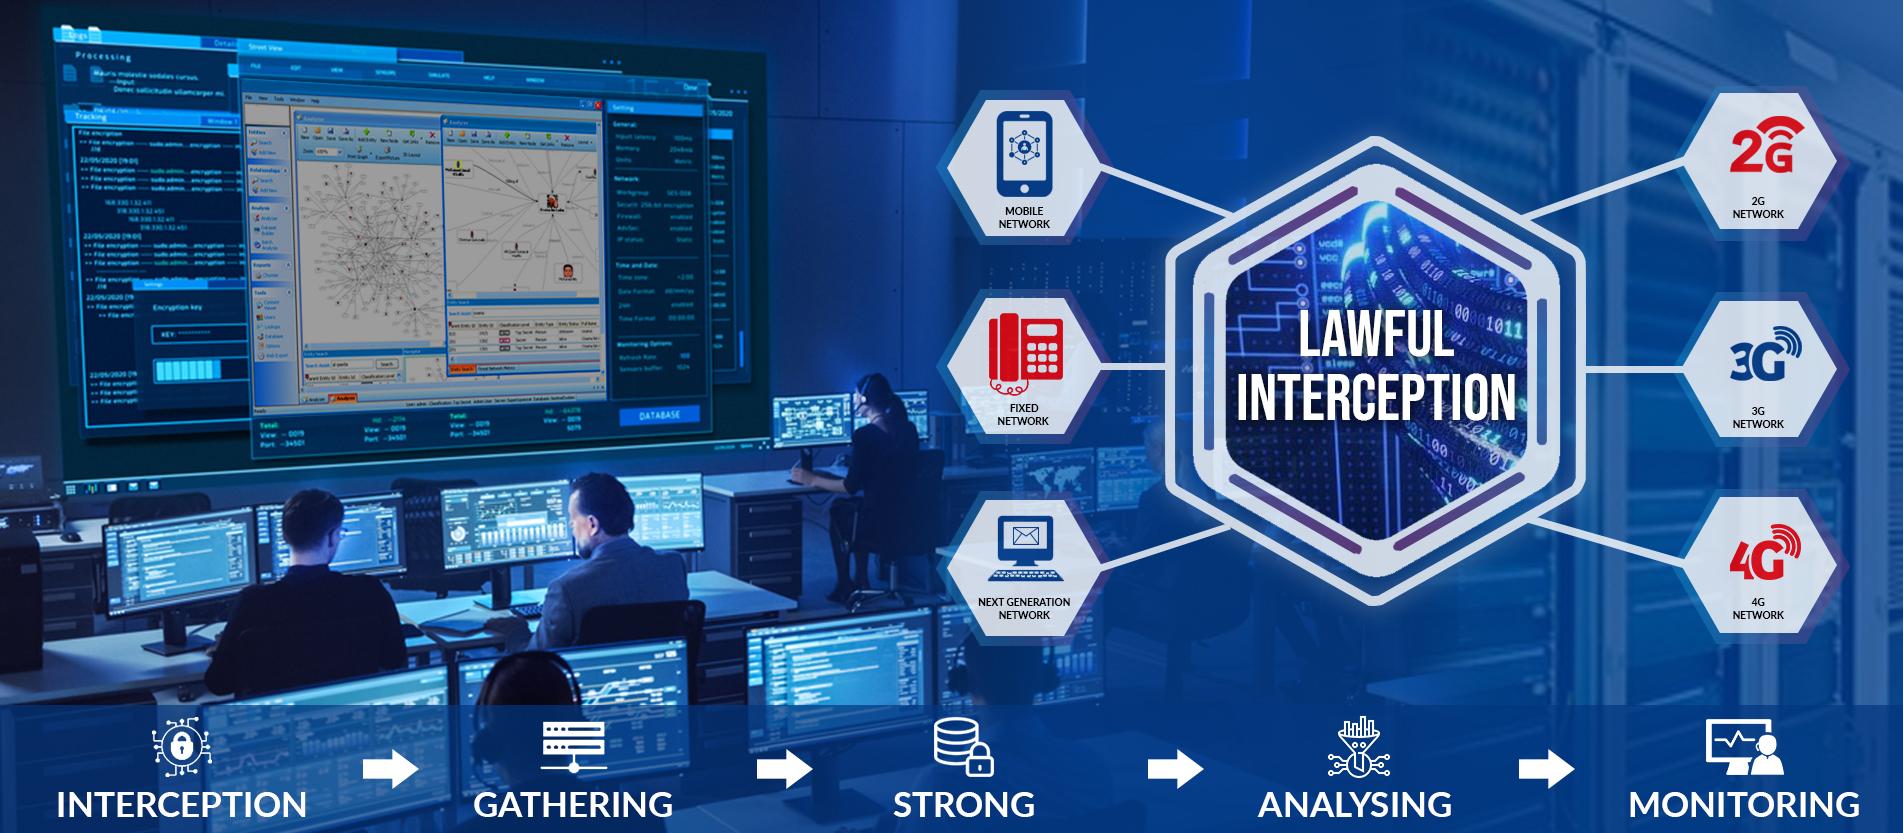 Lawful Interception